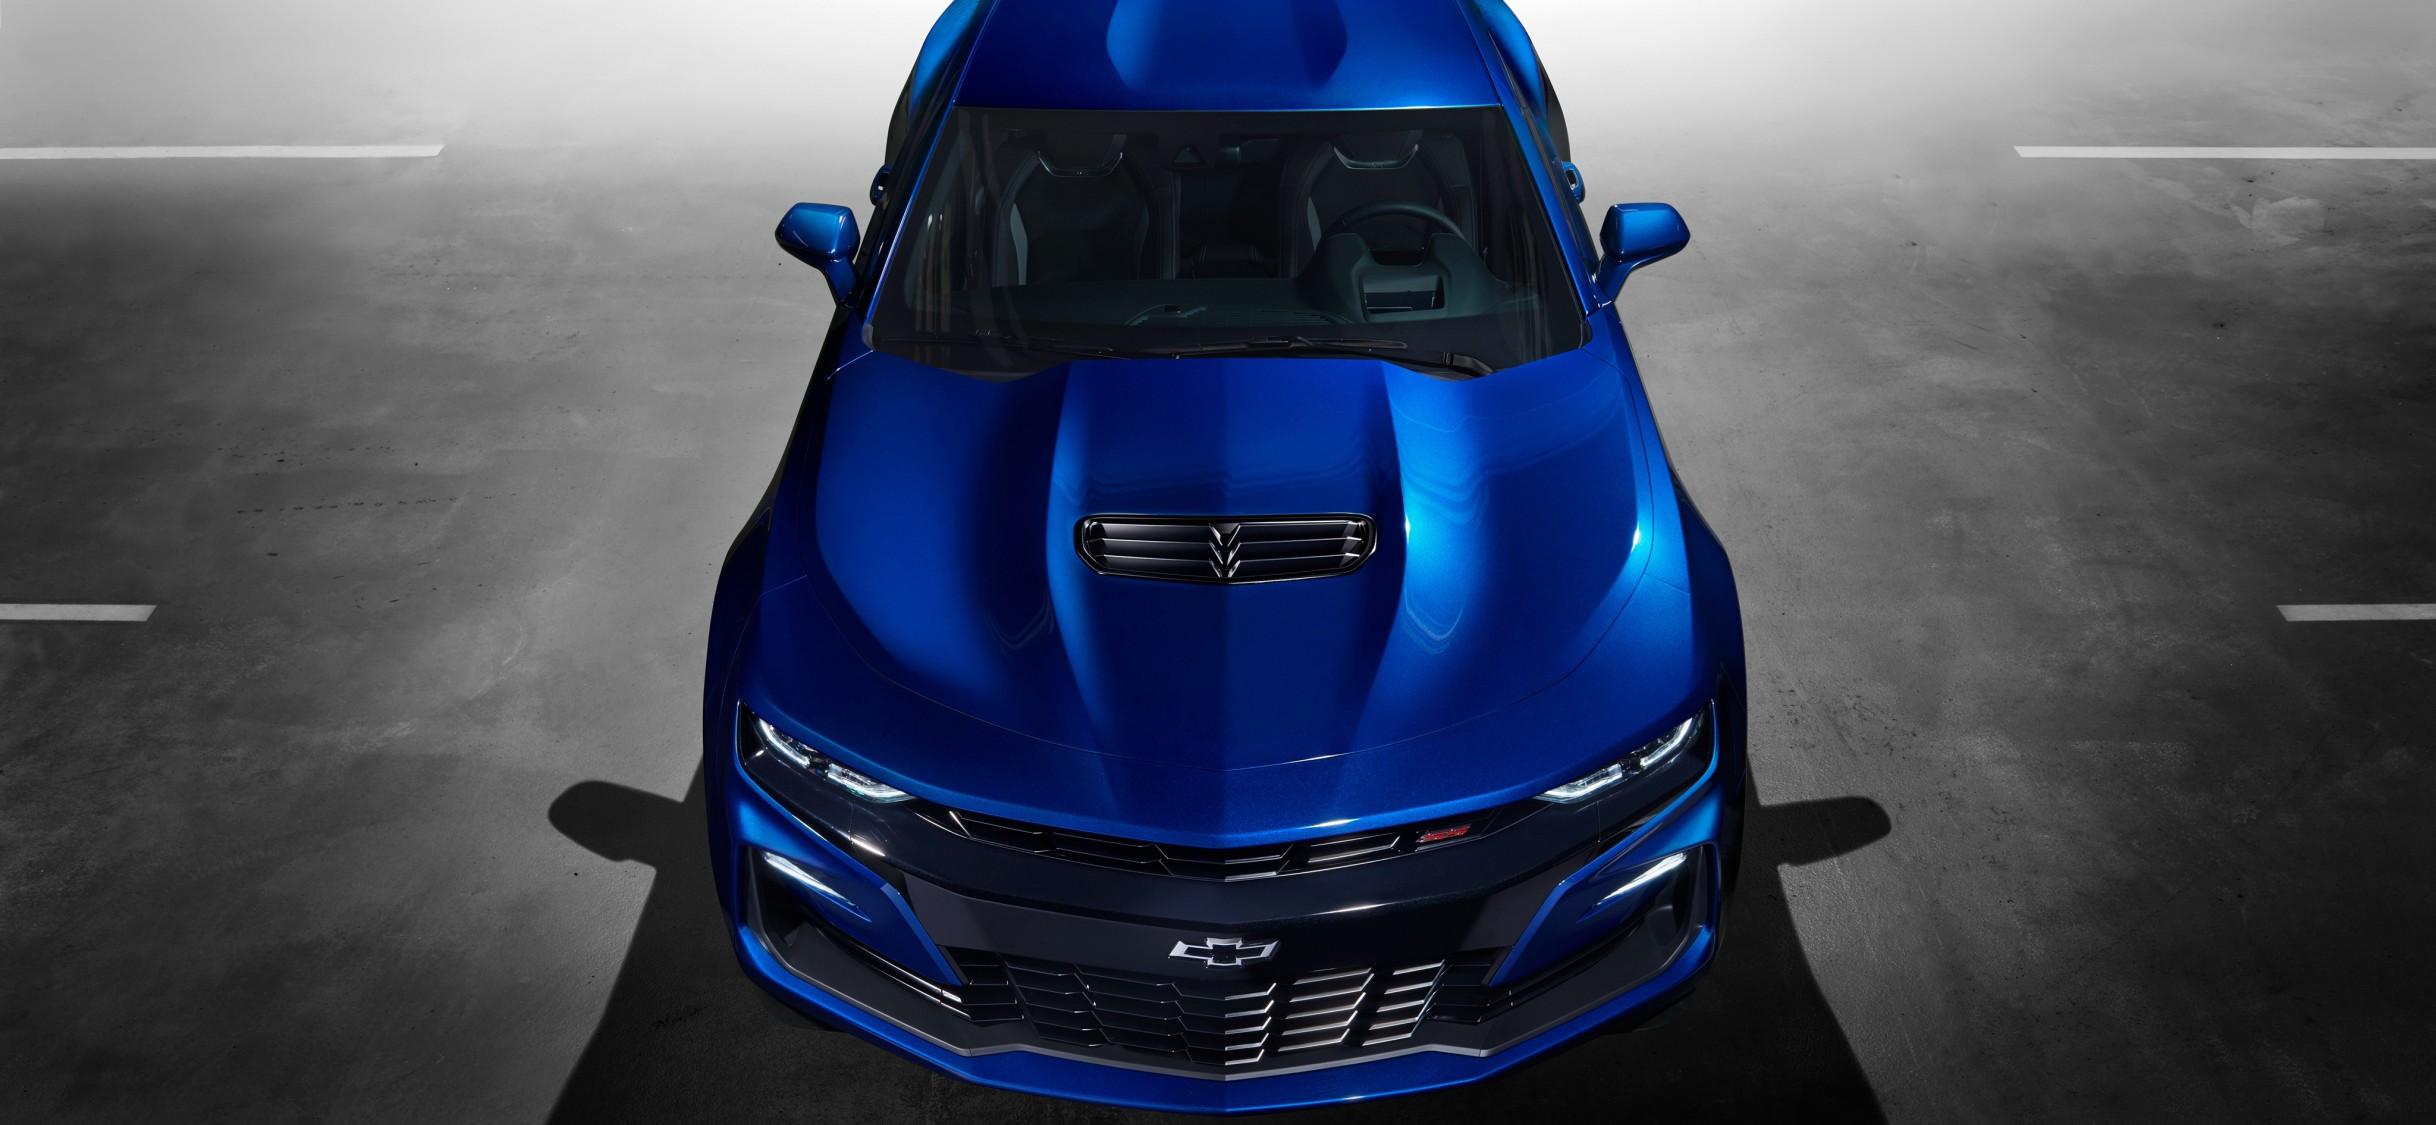 2019 Chevrolet Camaro Ss 4k Car Wallpaper Iphone X Hd Wallpaper